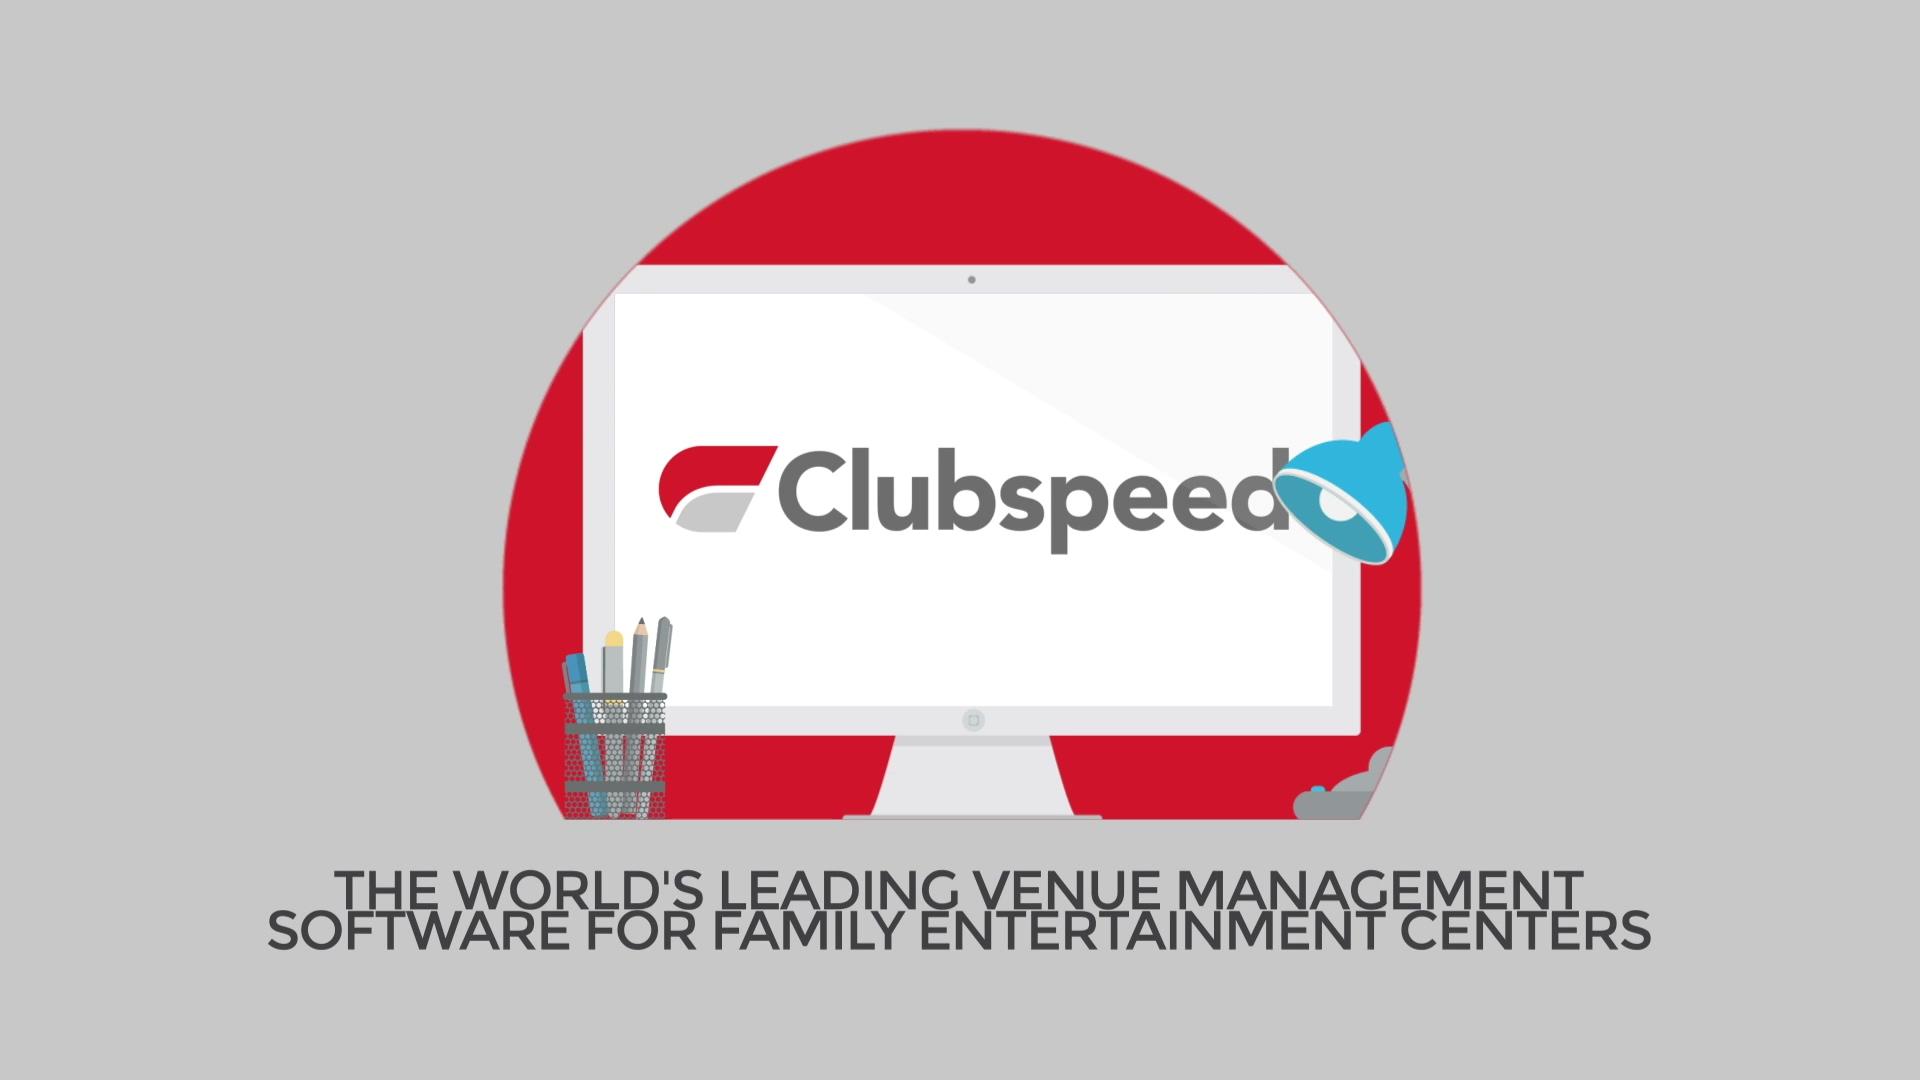 30secondexplainervideos-Clubspeed_V4